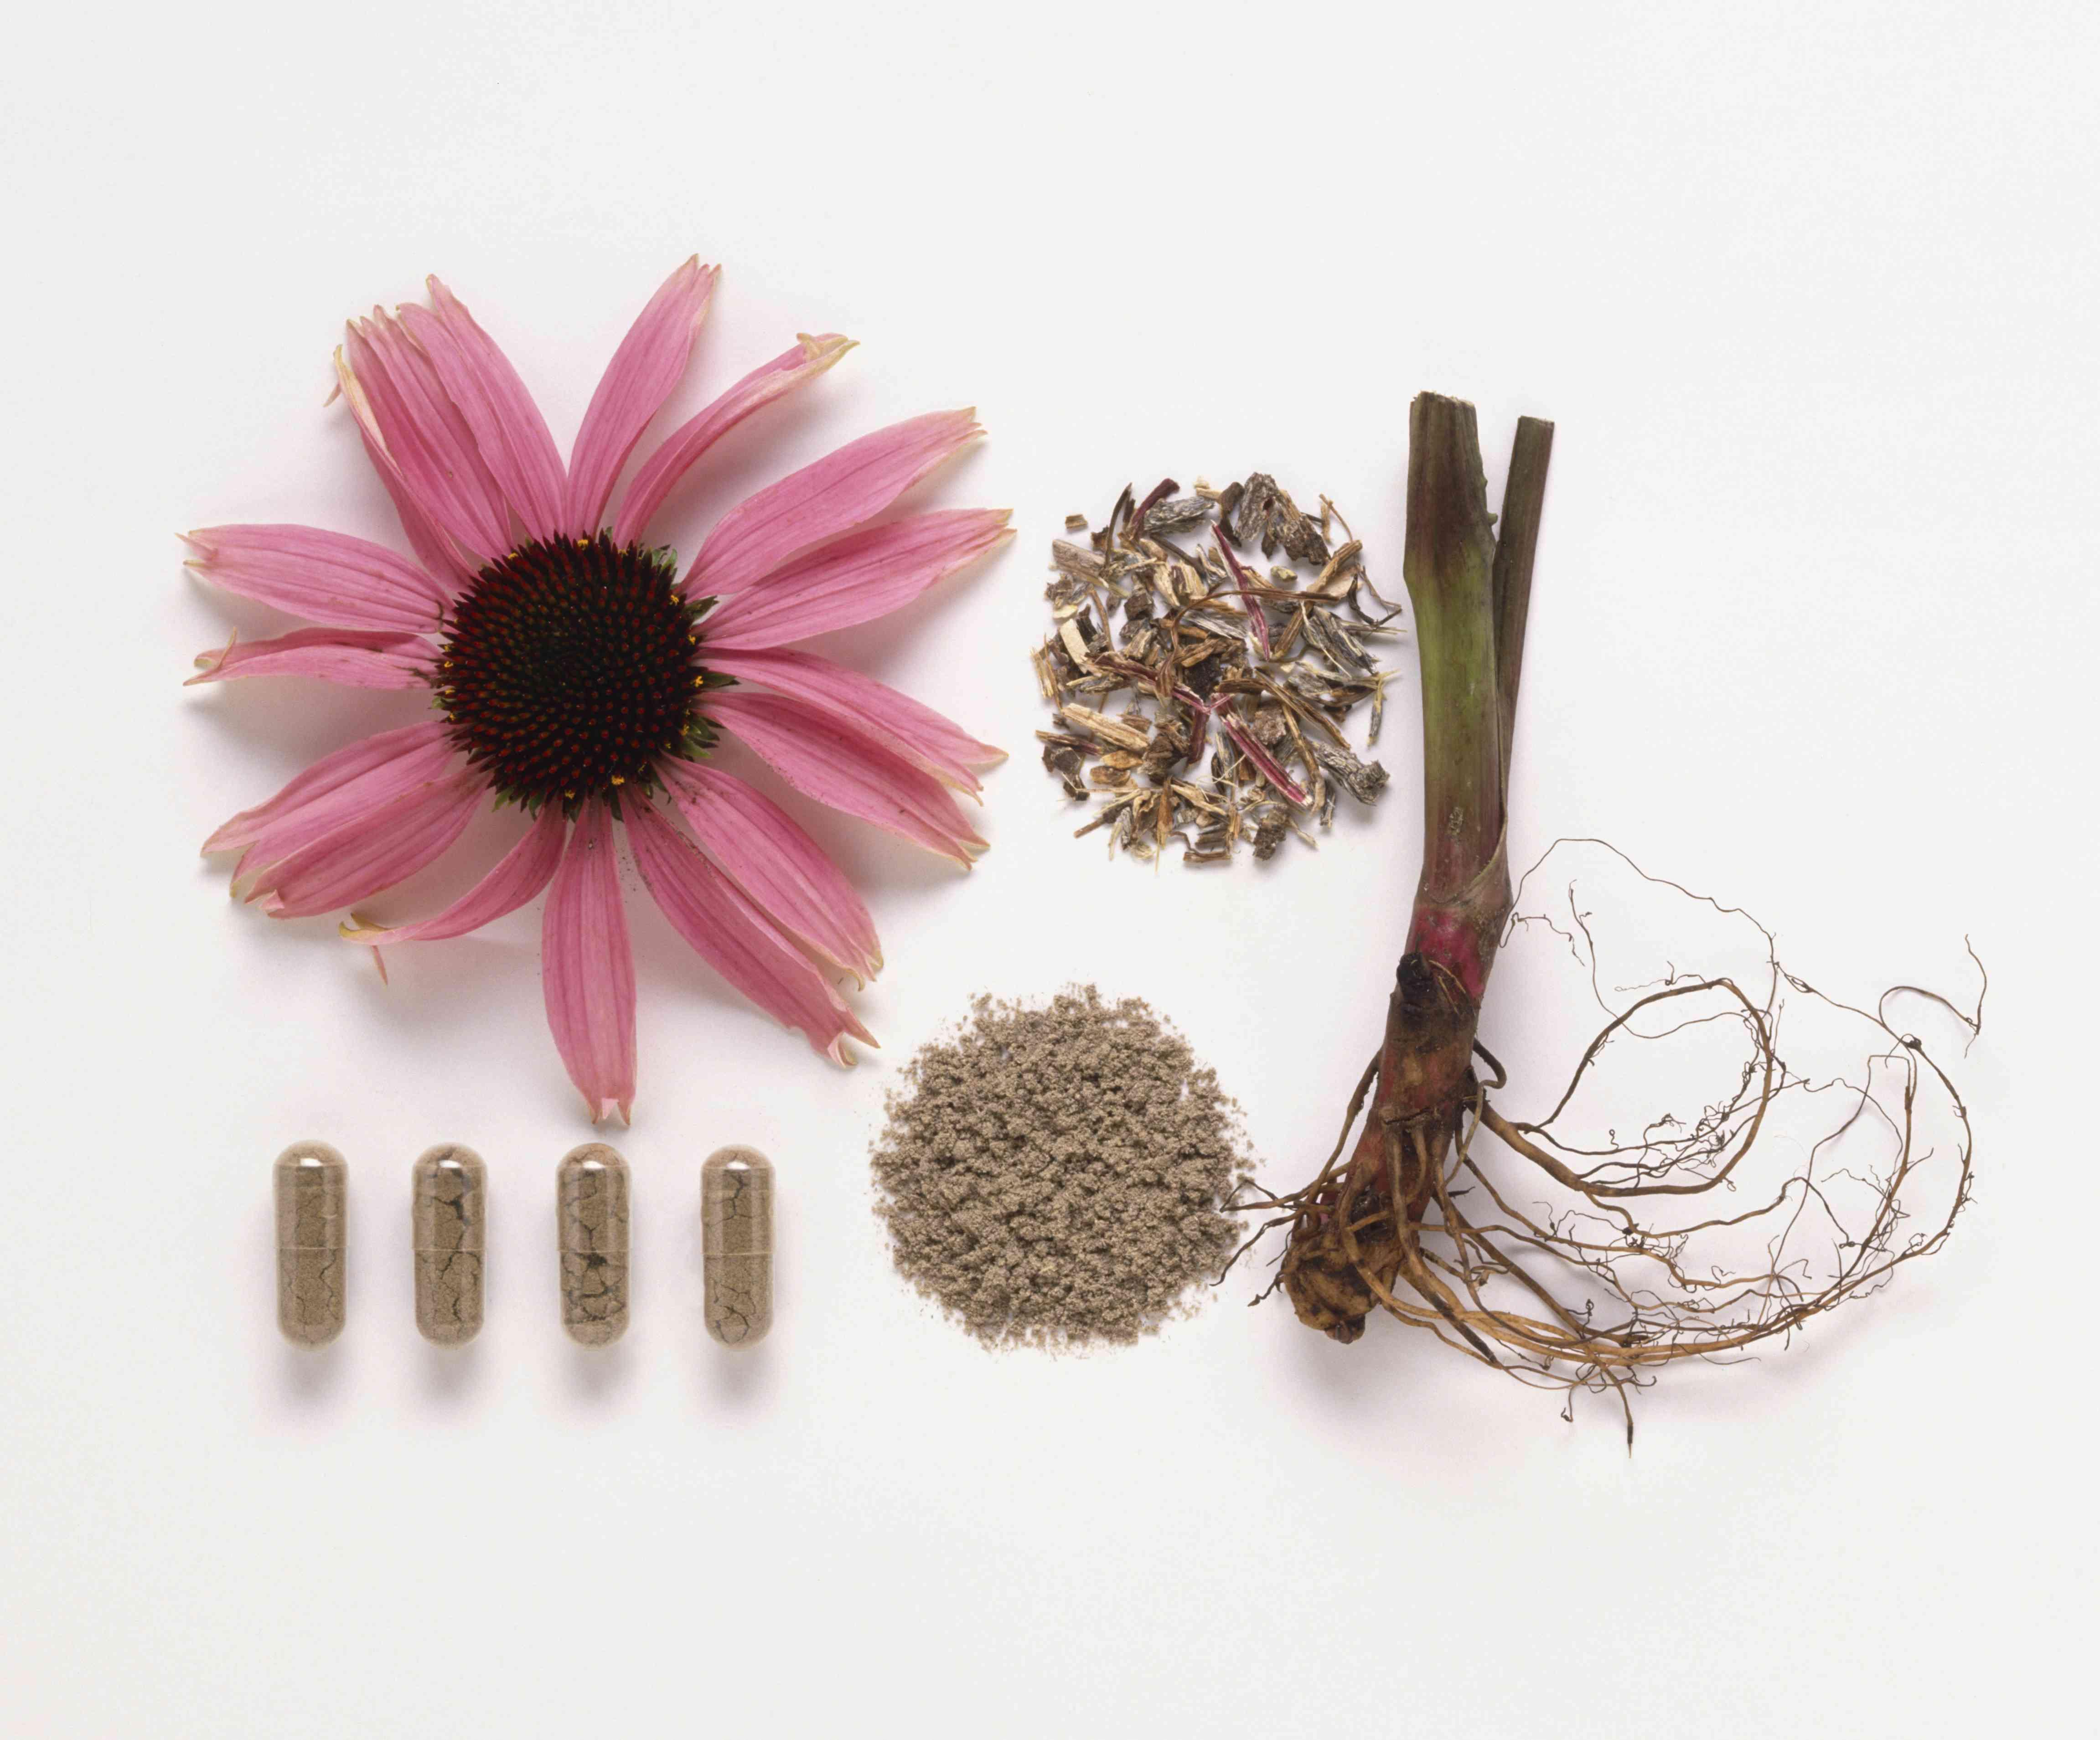 Echinacea, purple coneflower, fresh and dried root, and capsules